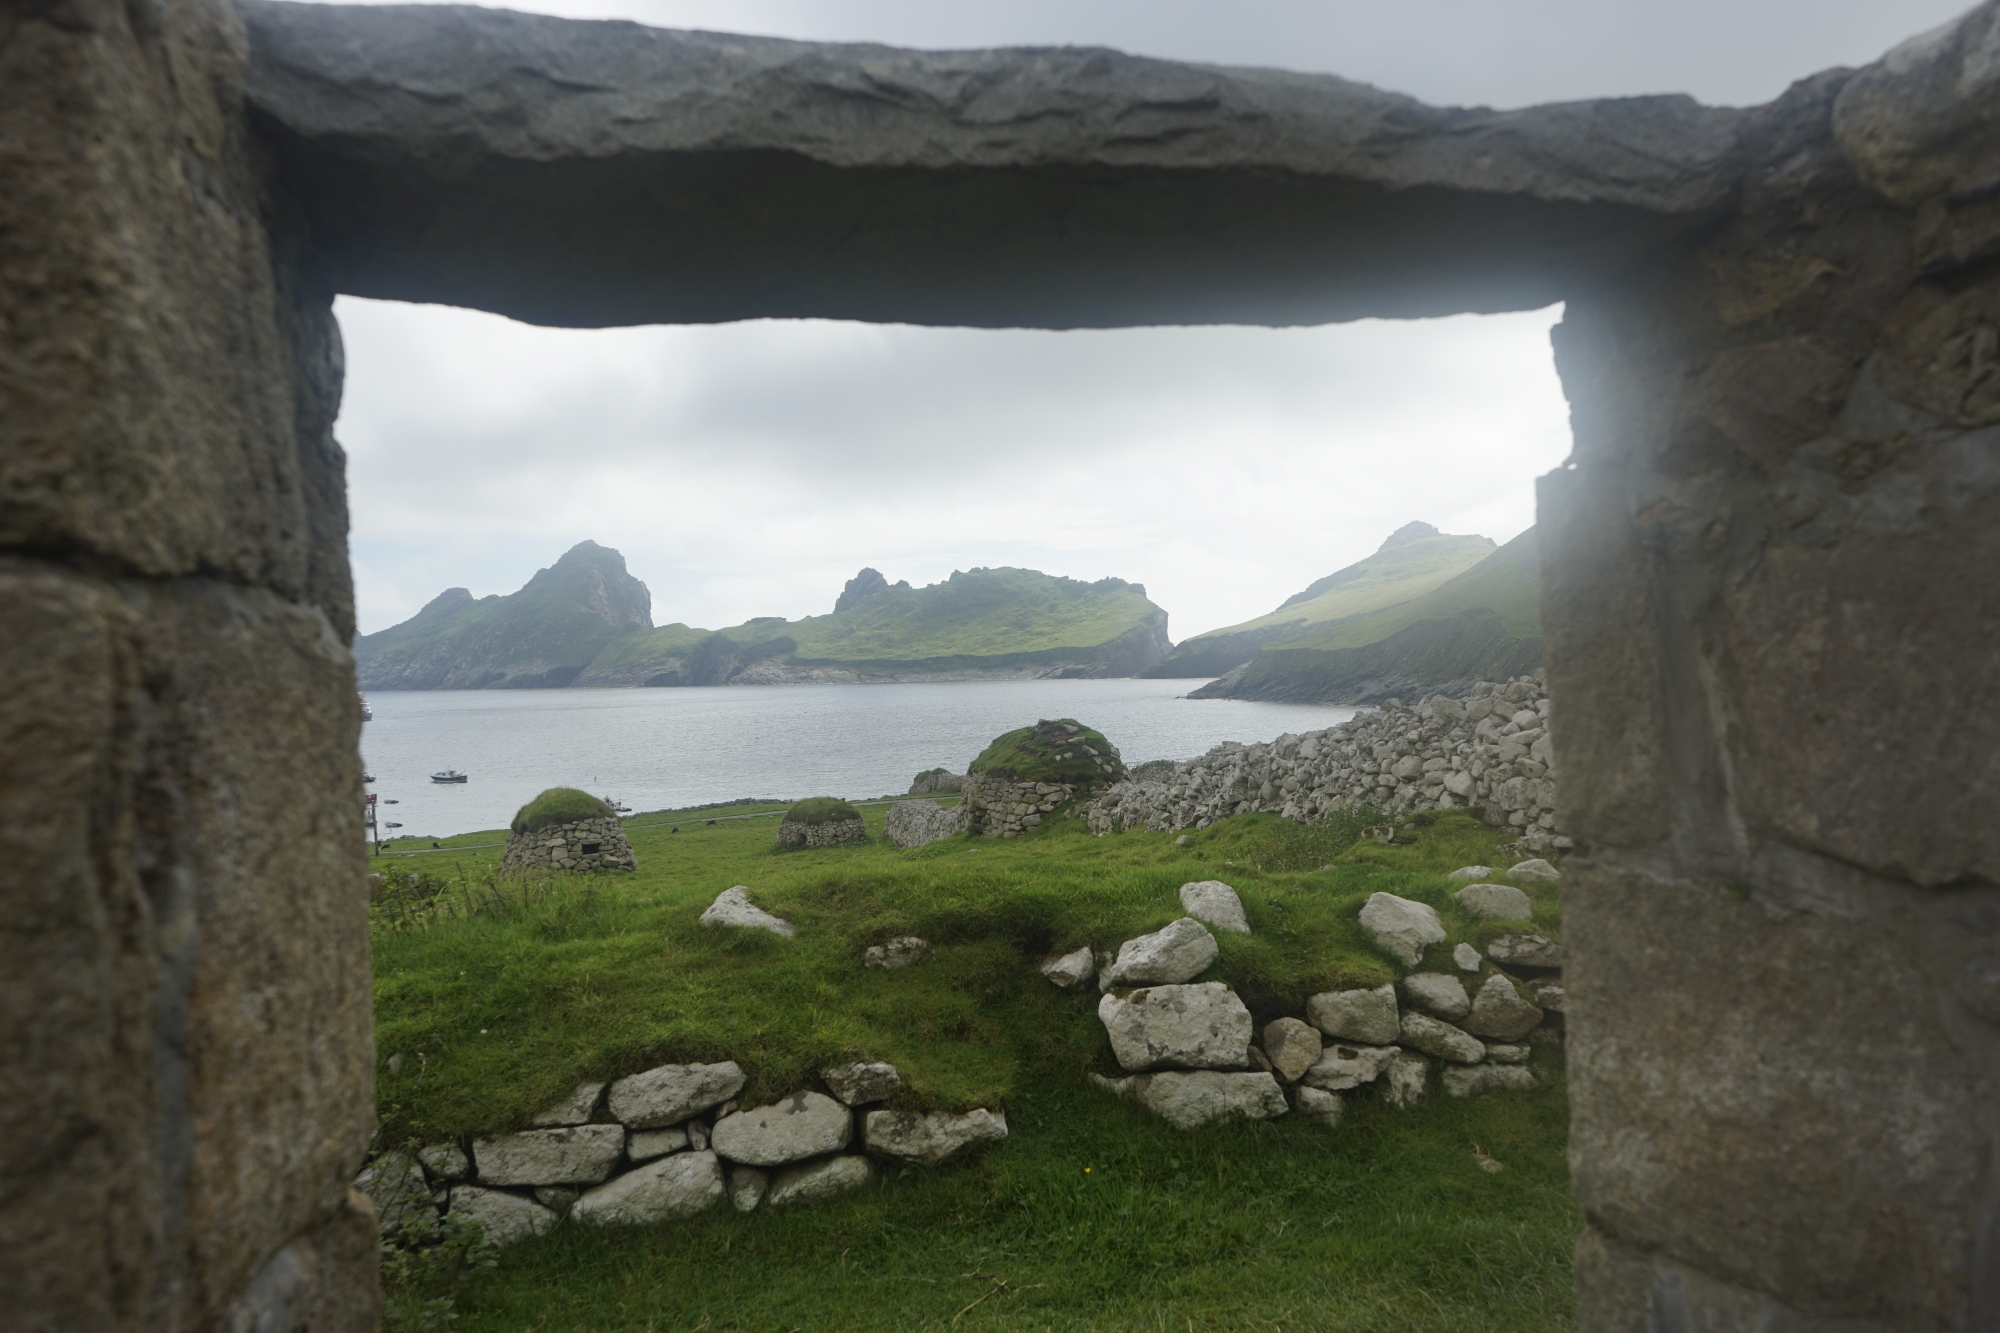 Soay, The Sheep of of St. Kilda, Scotland